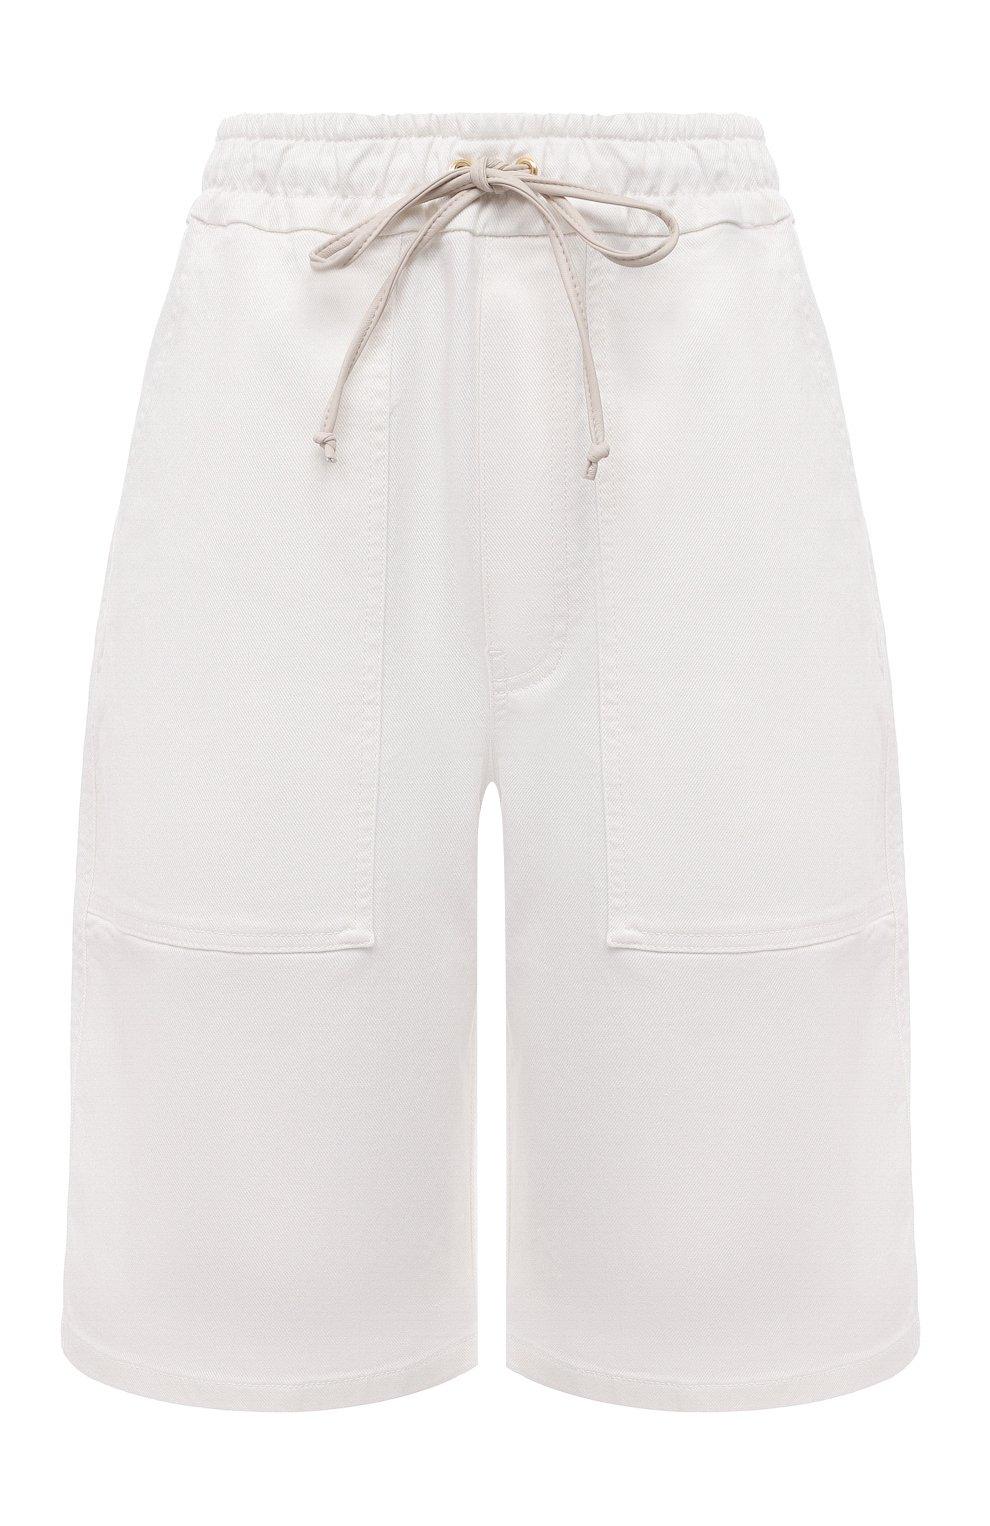 Женские хлопковые шорты NANUSHKA белого цвета, арт. HADI_WHITE_C0MF0RT STRETCH DENIM   Фото 1